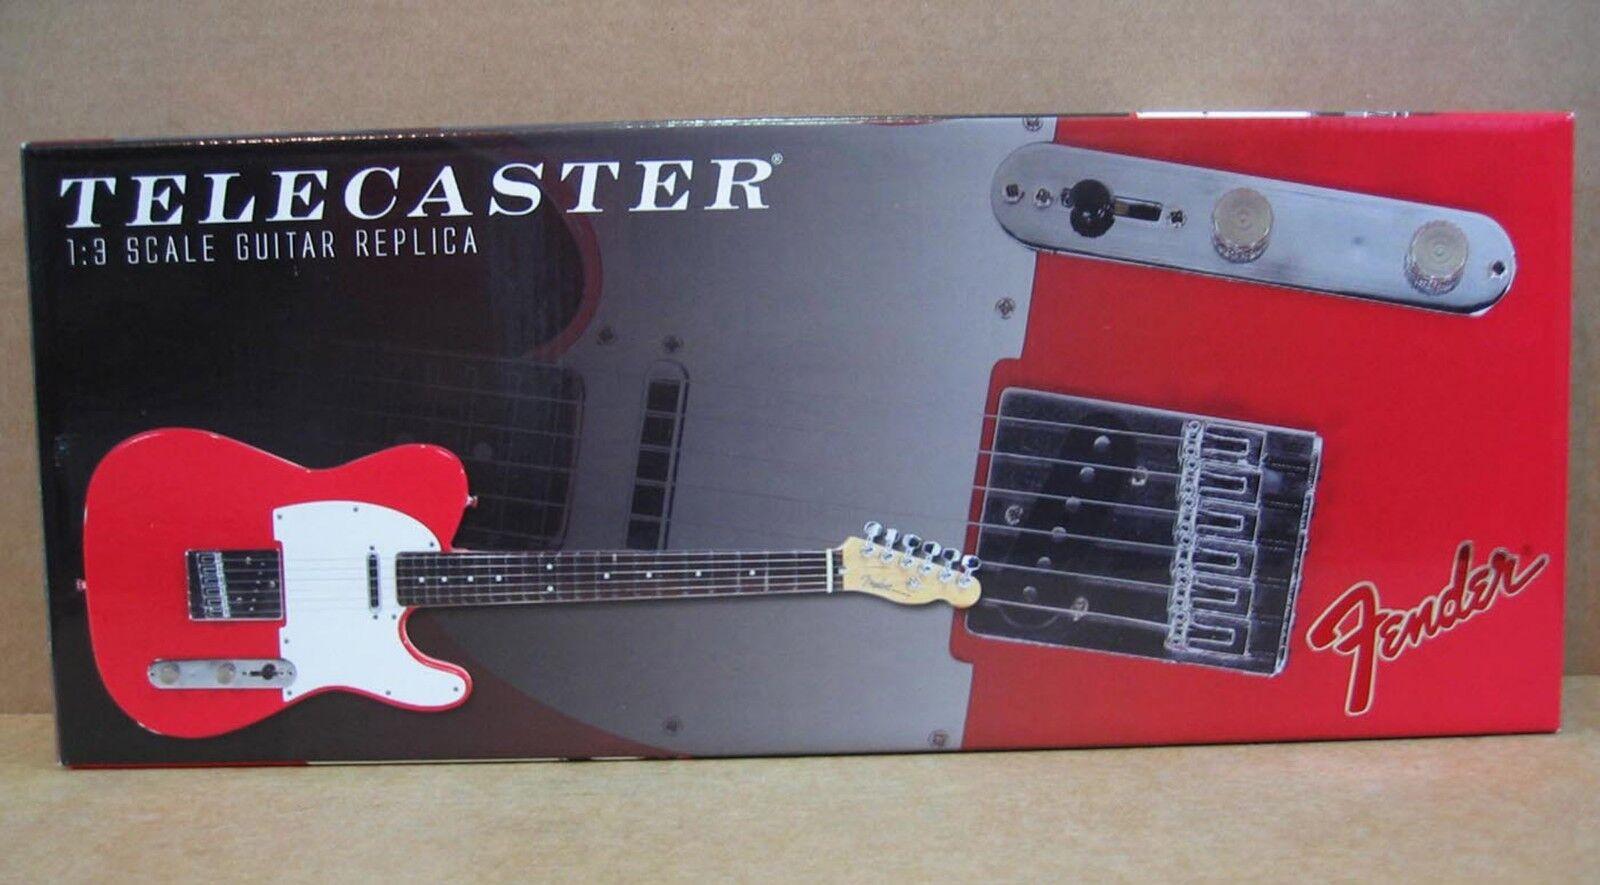 GMP Guitarra Fender Fender Fender Telecaster Réplica Mini rojo pantalla y montaje en parojo Die-cast 1 3 159be1